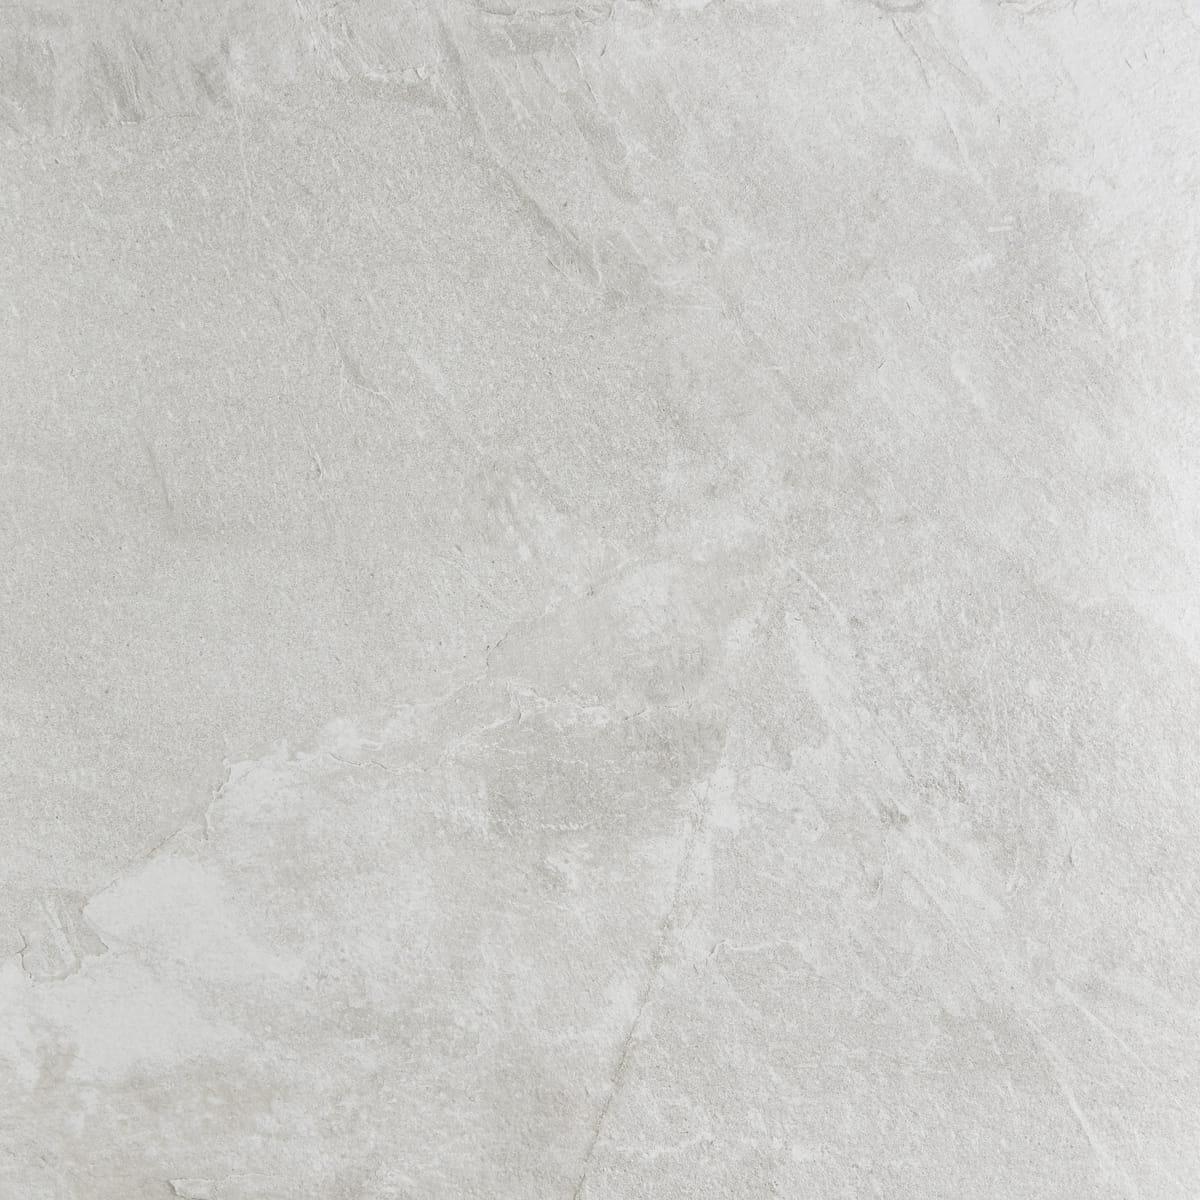 FOTO 1 sandstone white ant 75x75 3